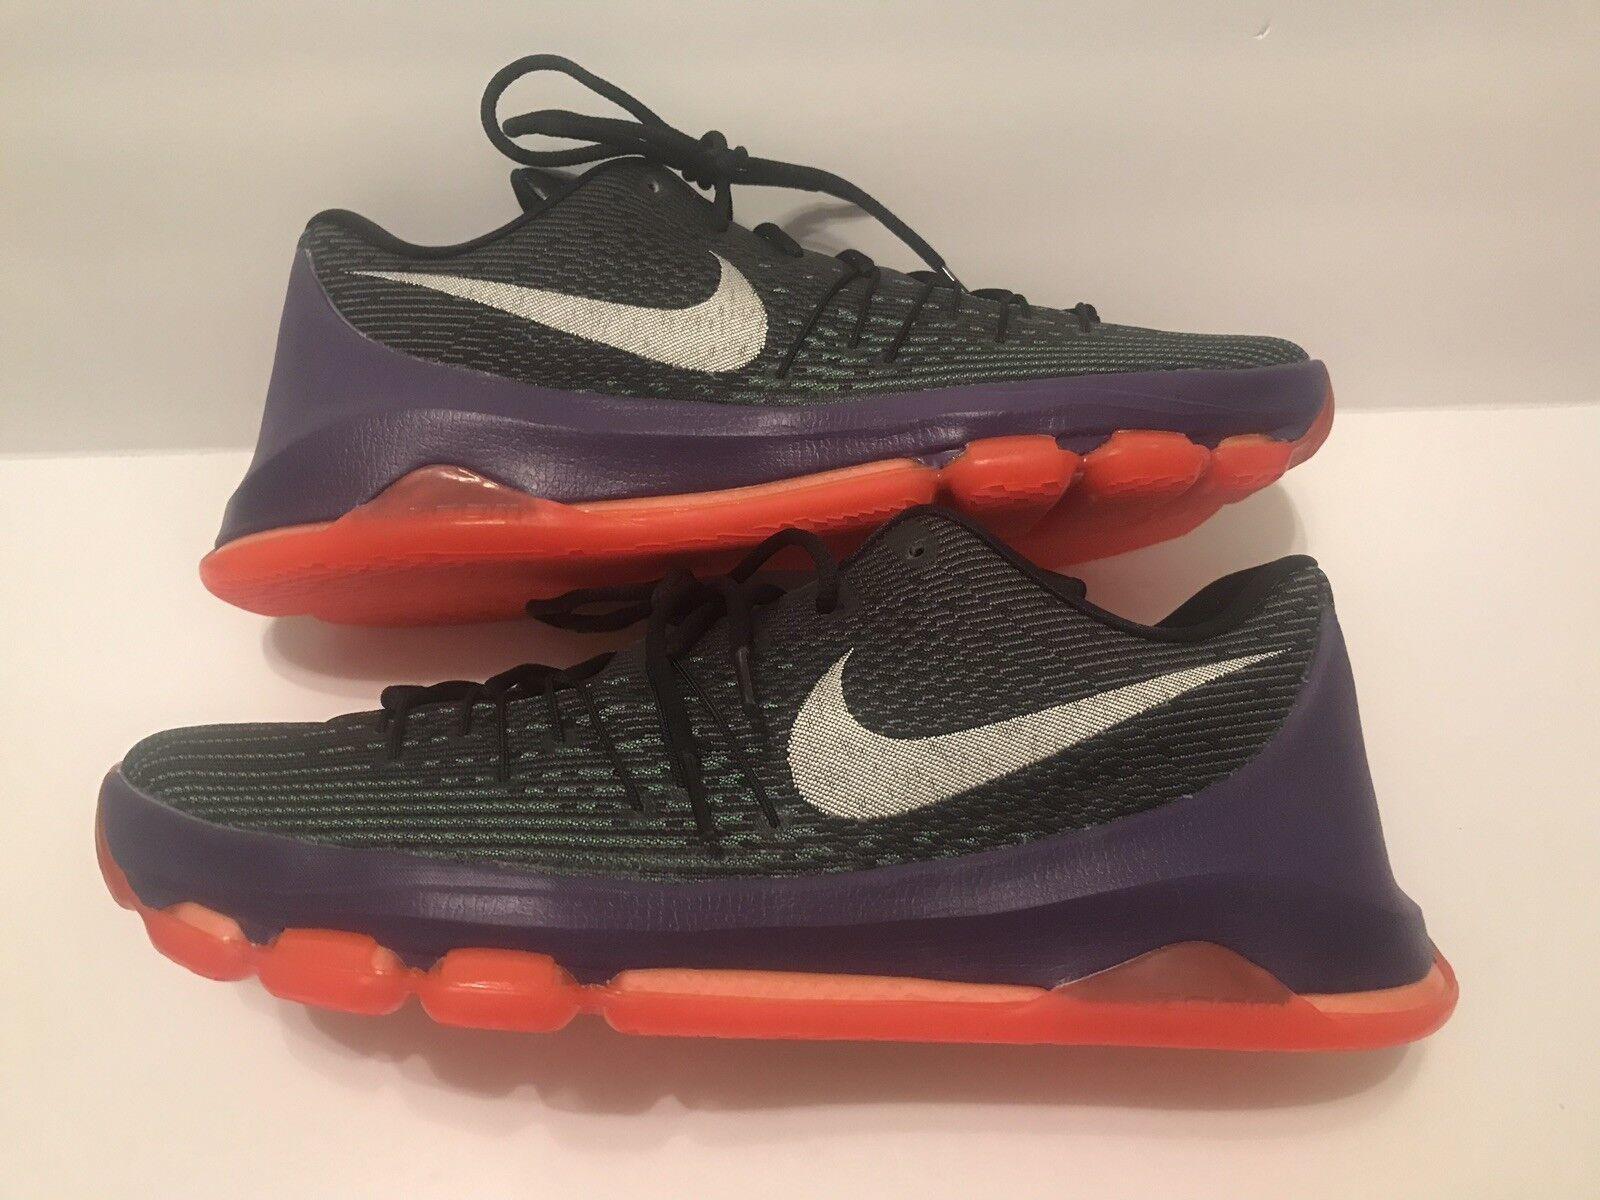 separation shoes 5be3b d245e NEW Nike Zoom KD KD KD 8 Vinary Black Green Basketball shoes Size 10.5  749375-